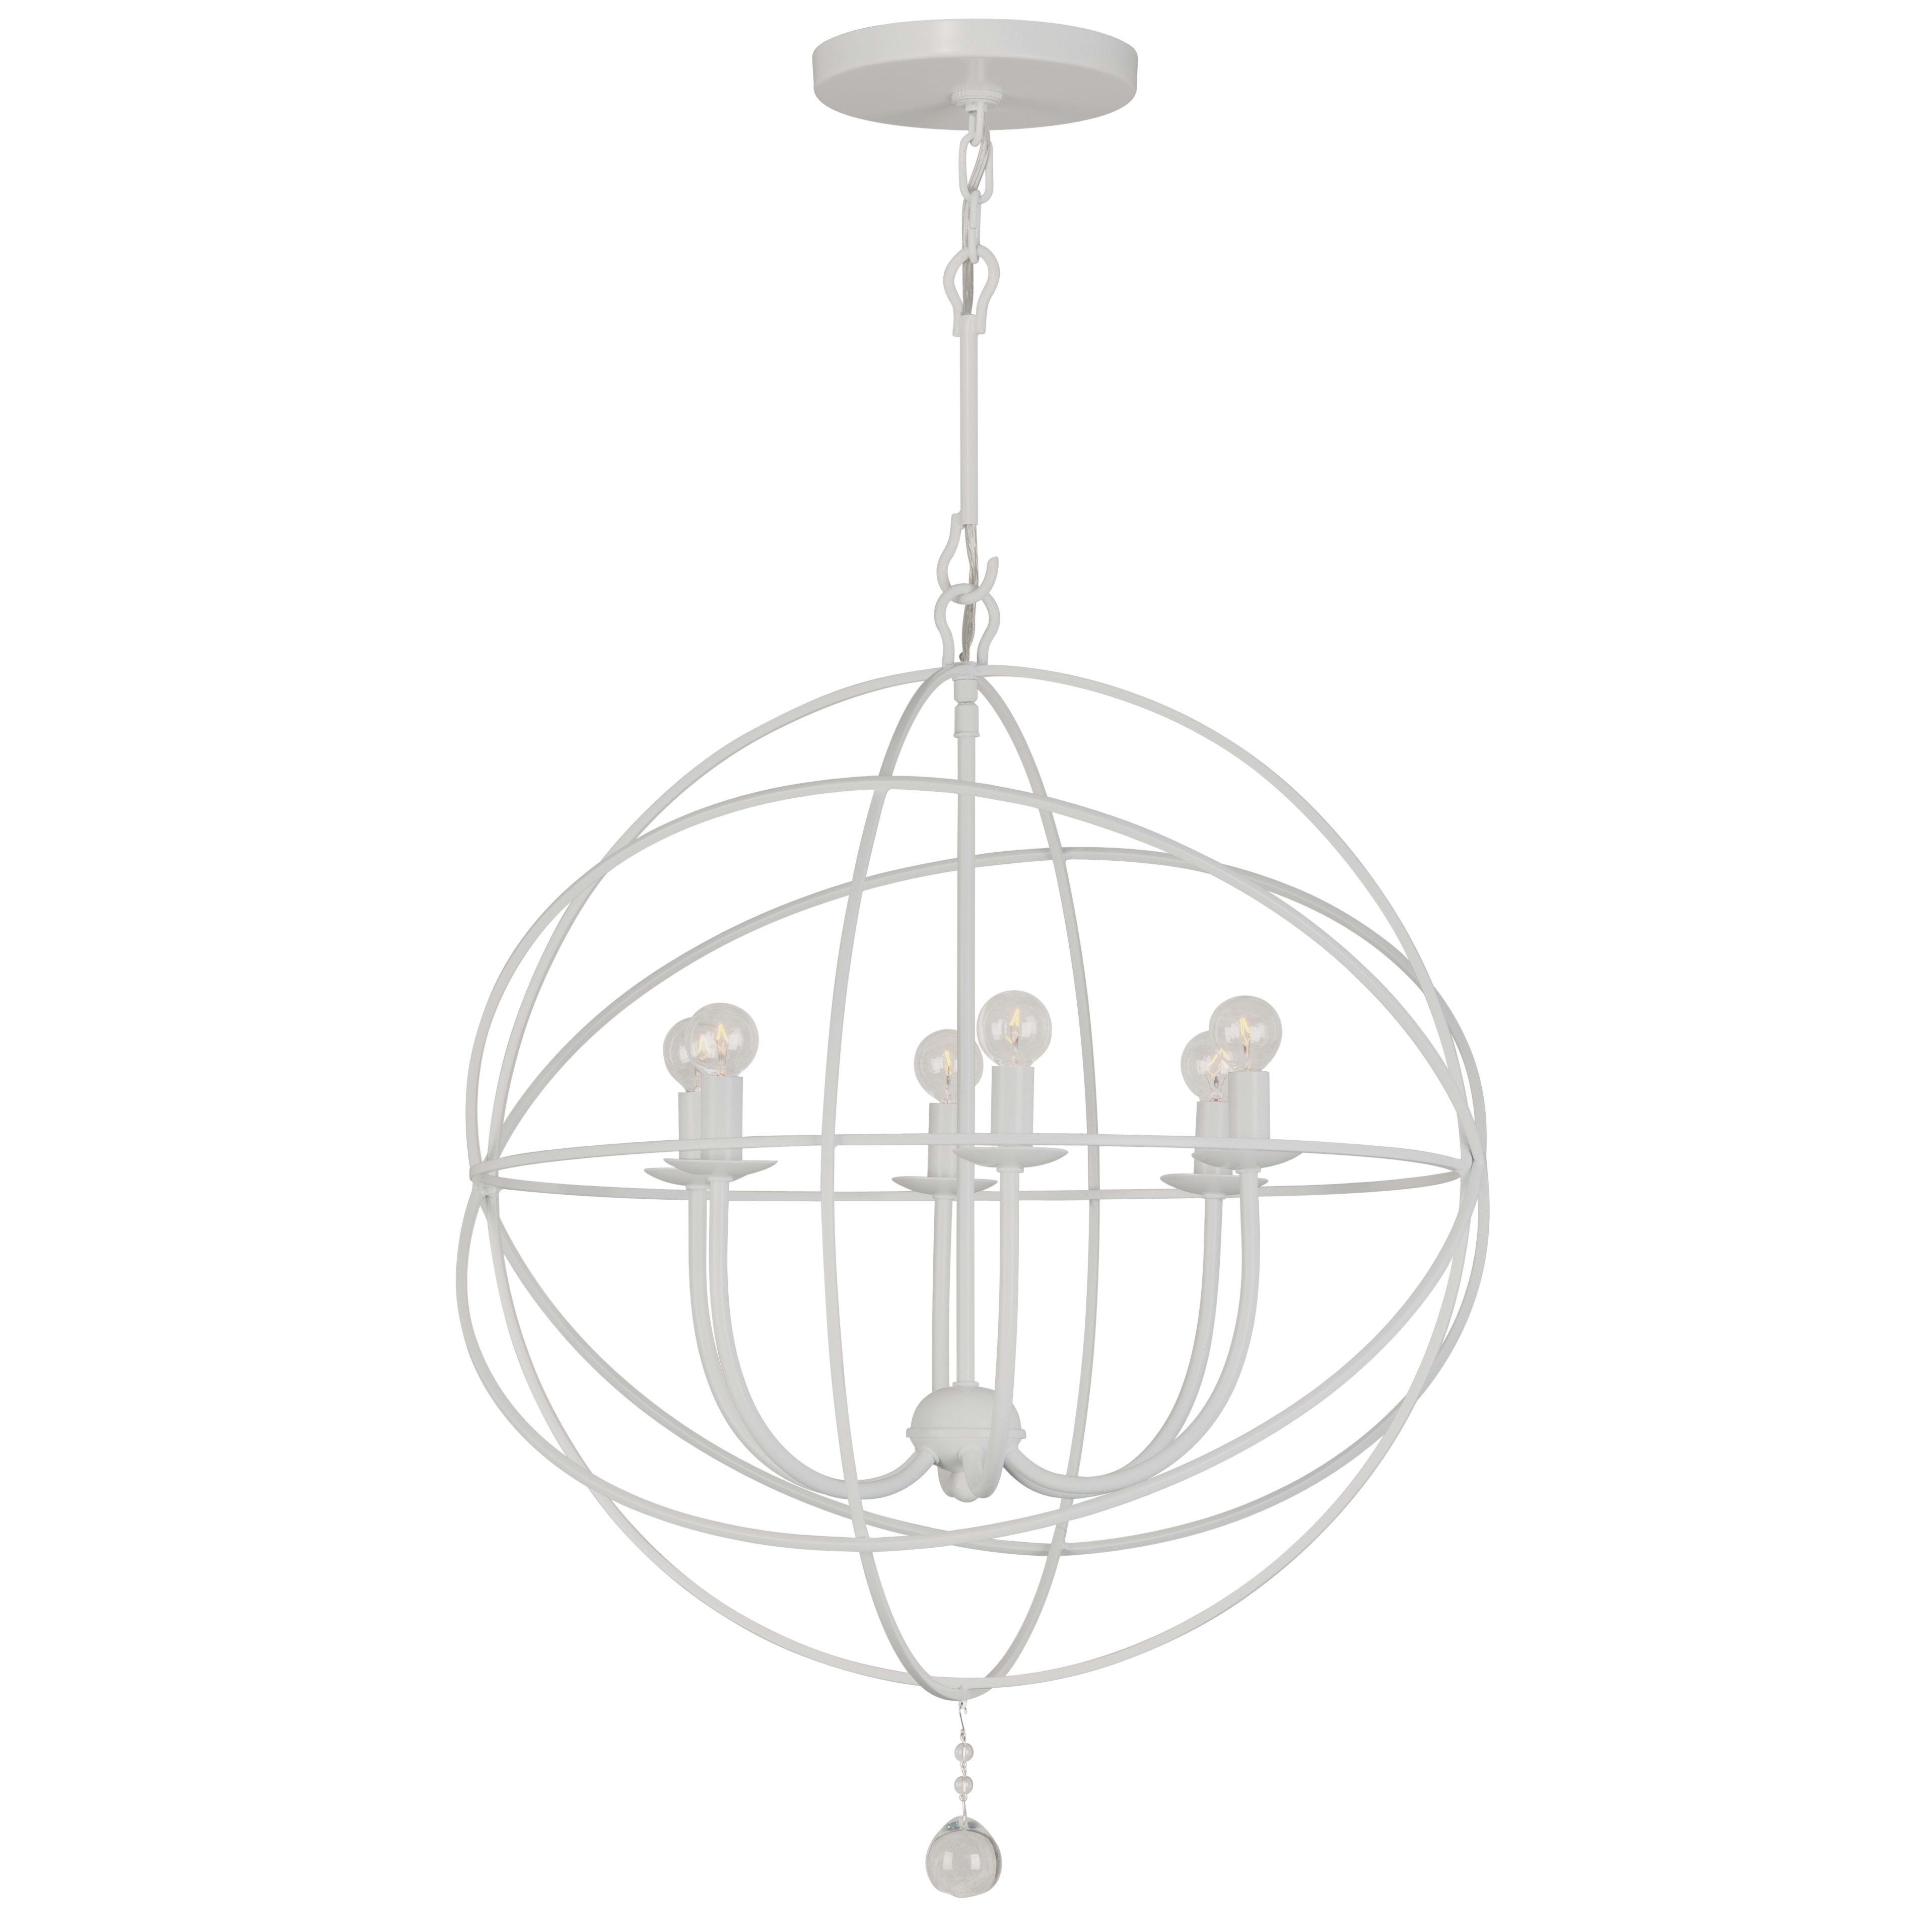 chandeliers w solaris bronze products antique charlotte lights crystal x h index all light chandelier xiertekusa and splendid grand pedant